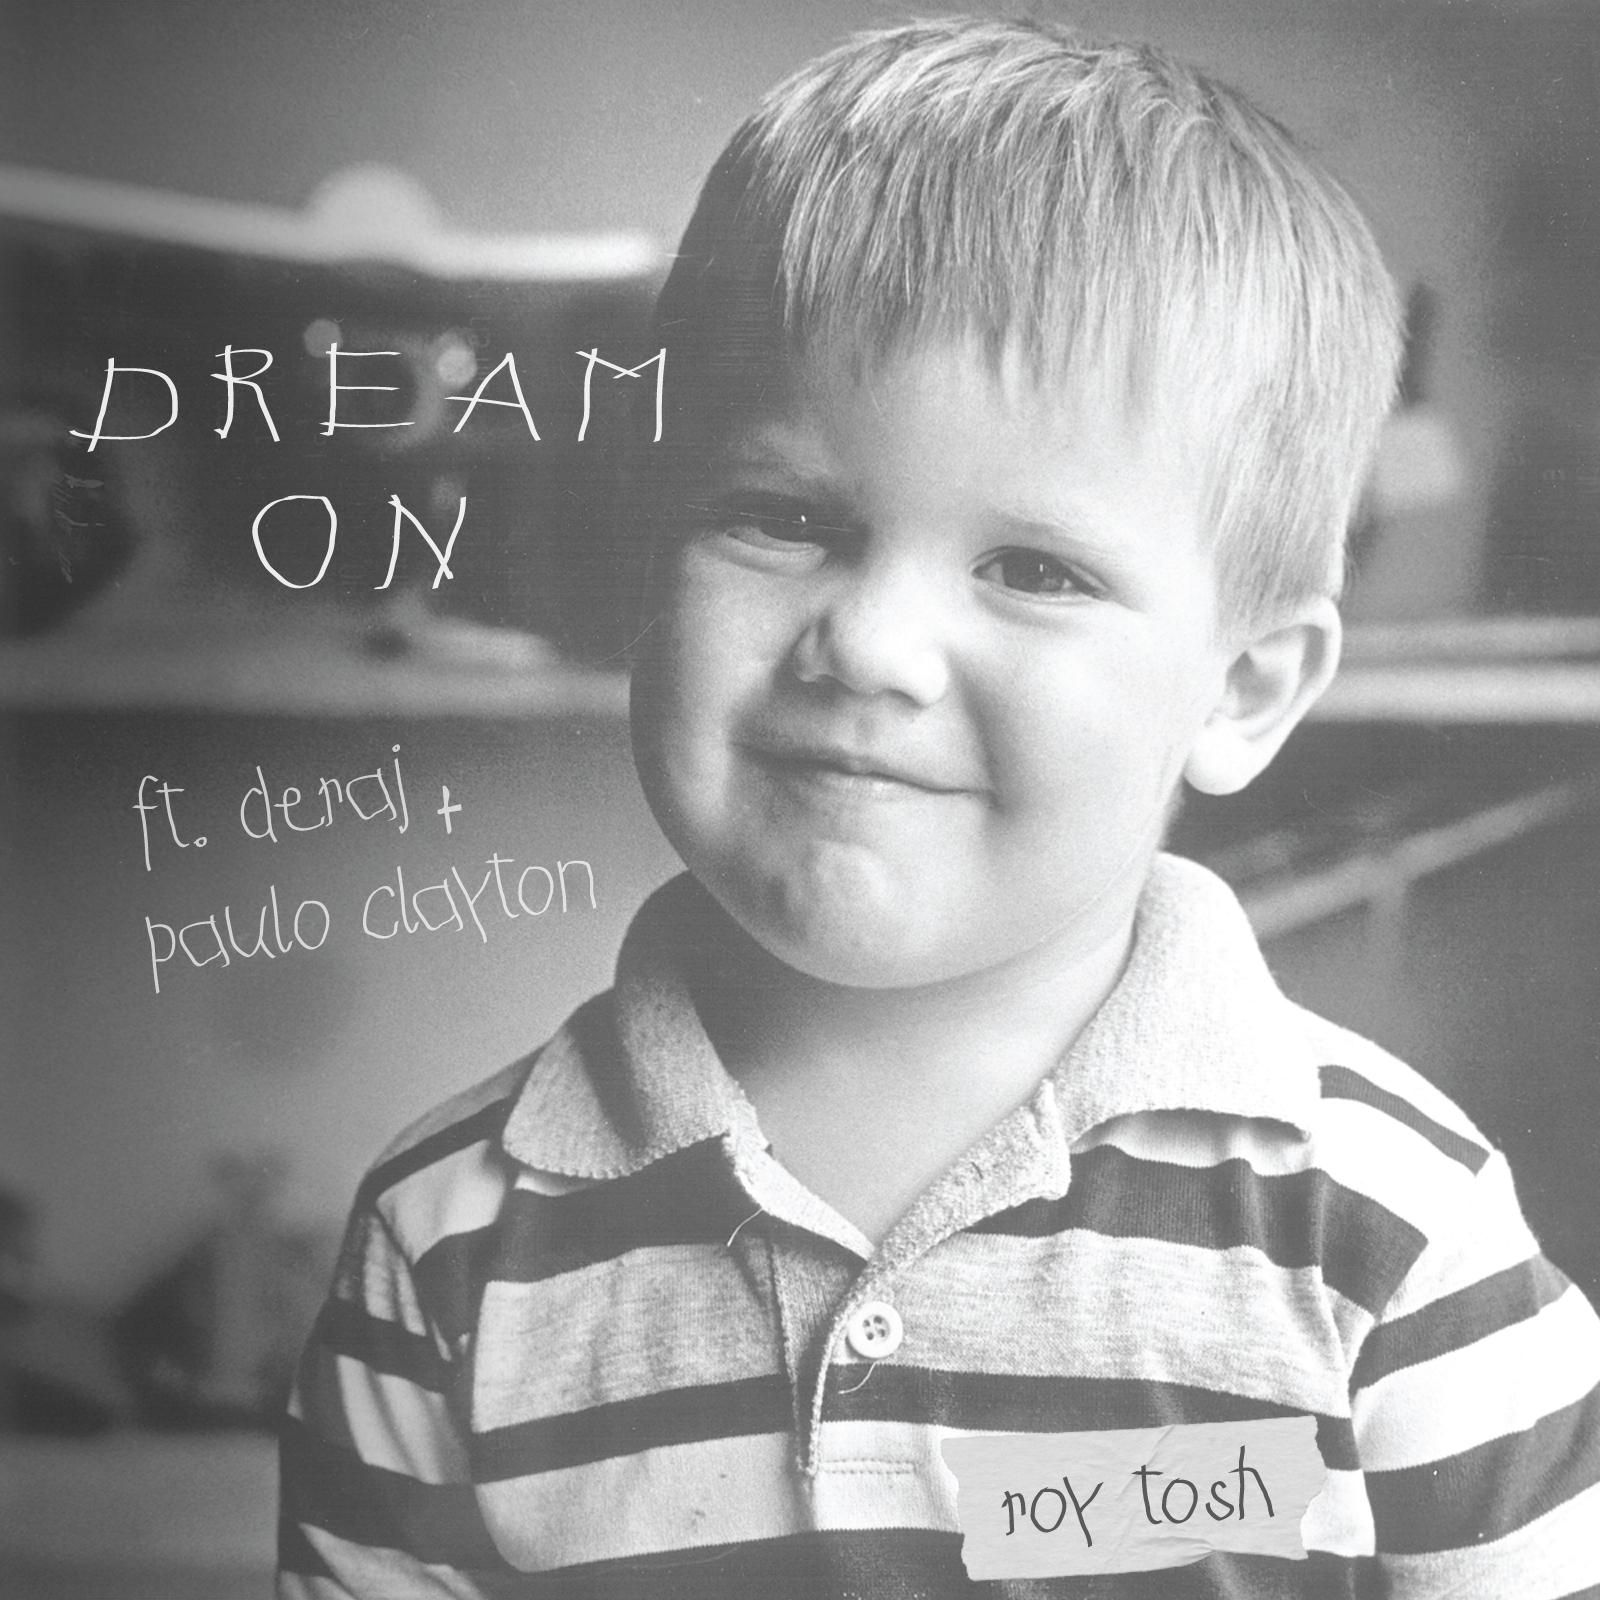 FREE DOWNLOAD – 'DREAM ON' FT. DERAJ & PAULO CLAYTON